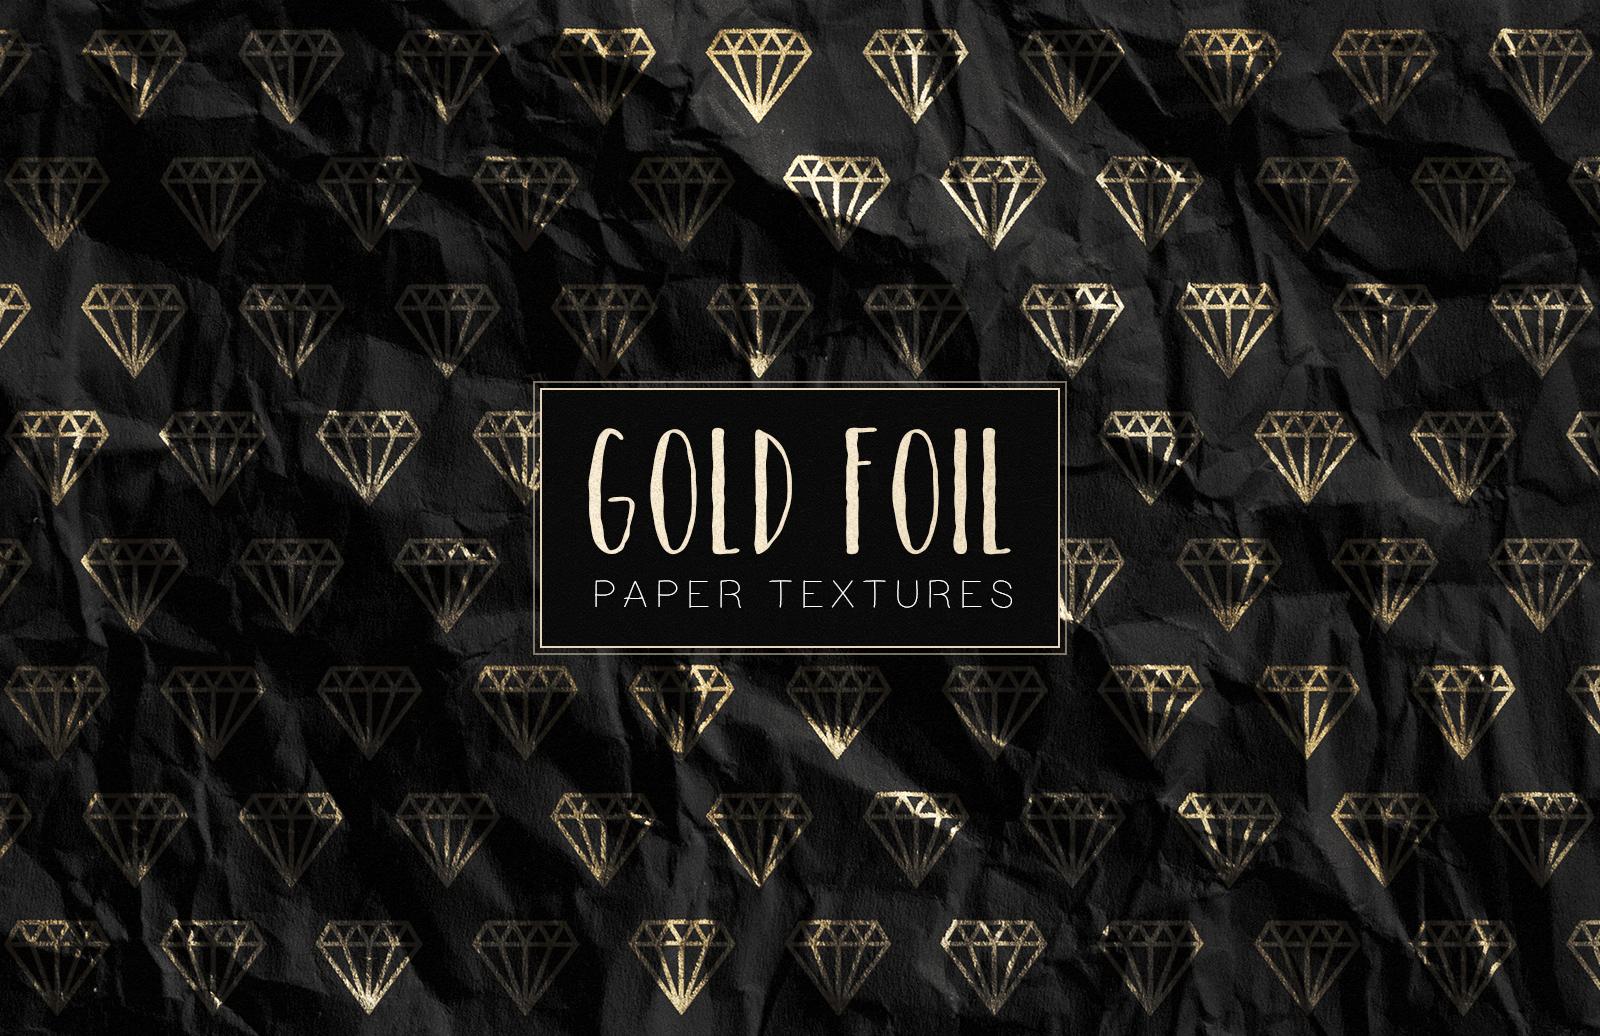 Gold  Foil  Paper  Textures  Preview 1